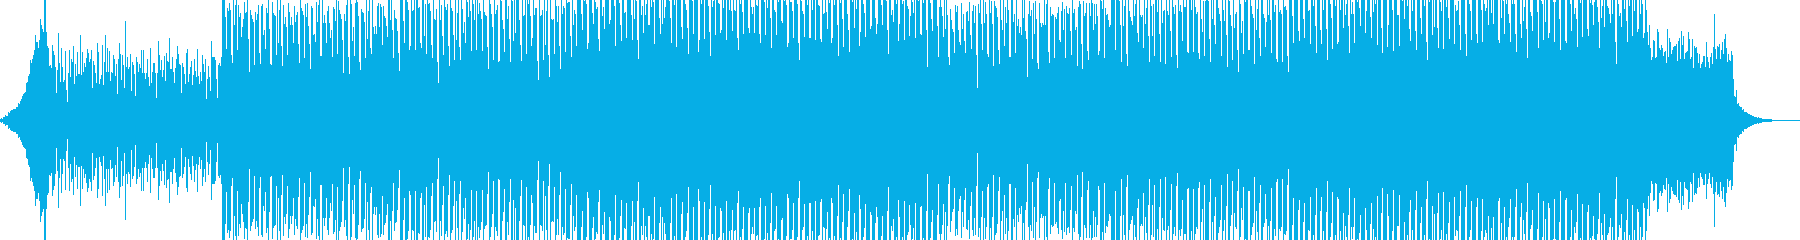 EDMクラブ系ダンスミュージック-116の再生済みの波形